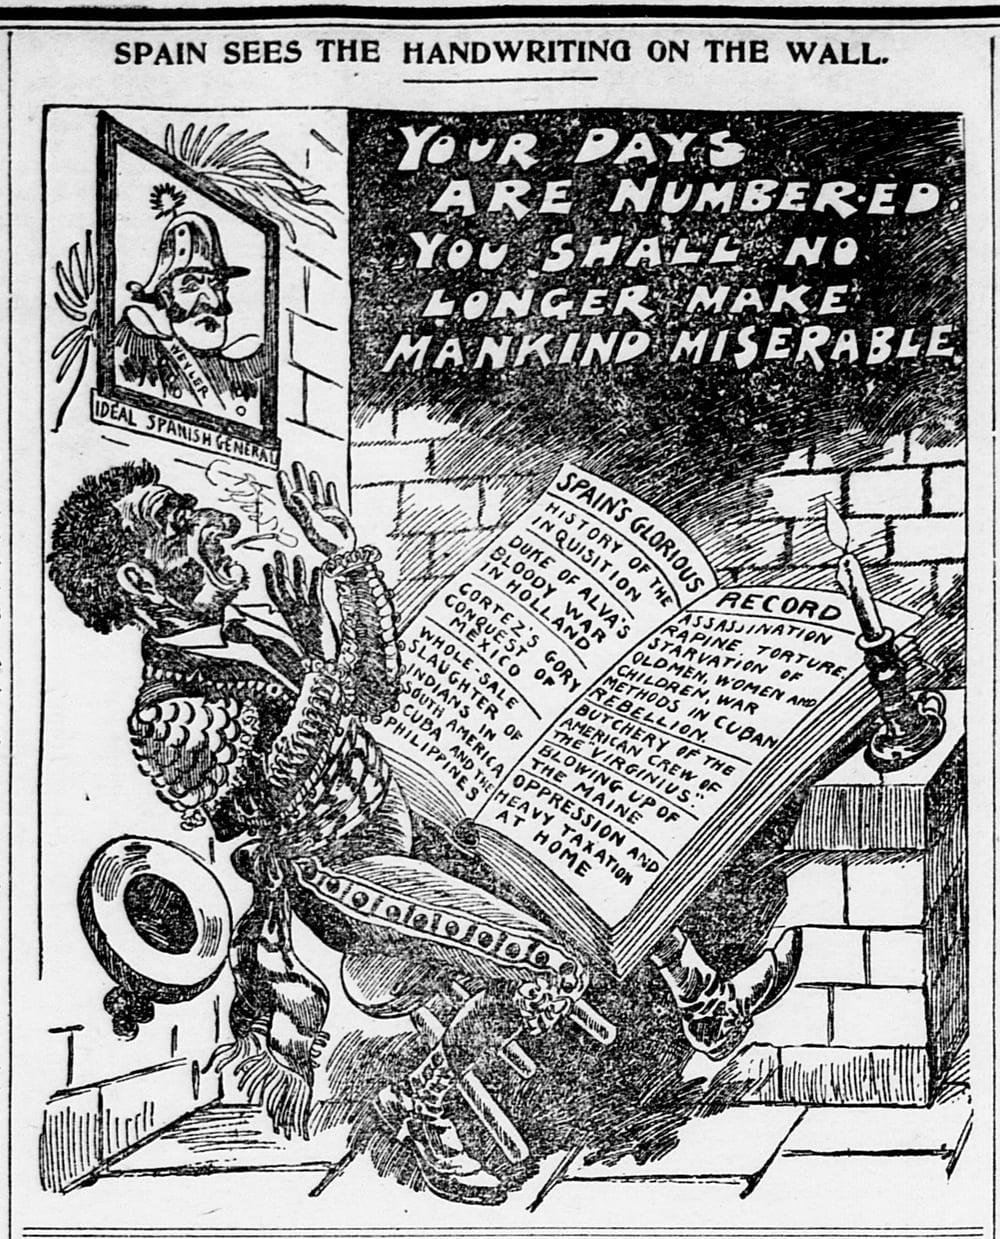 La guerra hispano-estadounidense de 1898 en viñetas 23